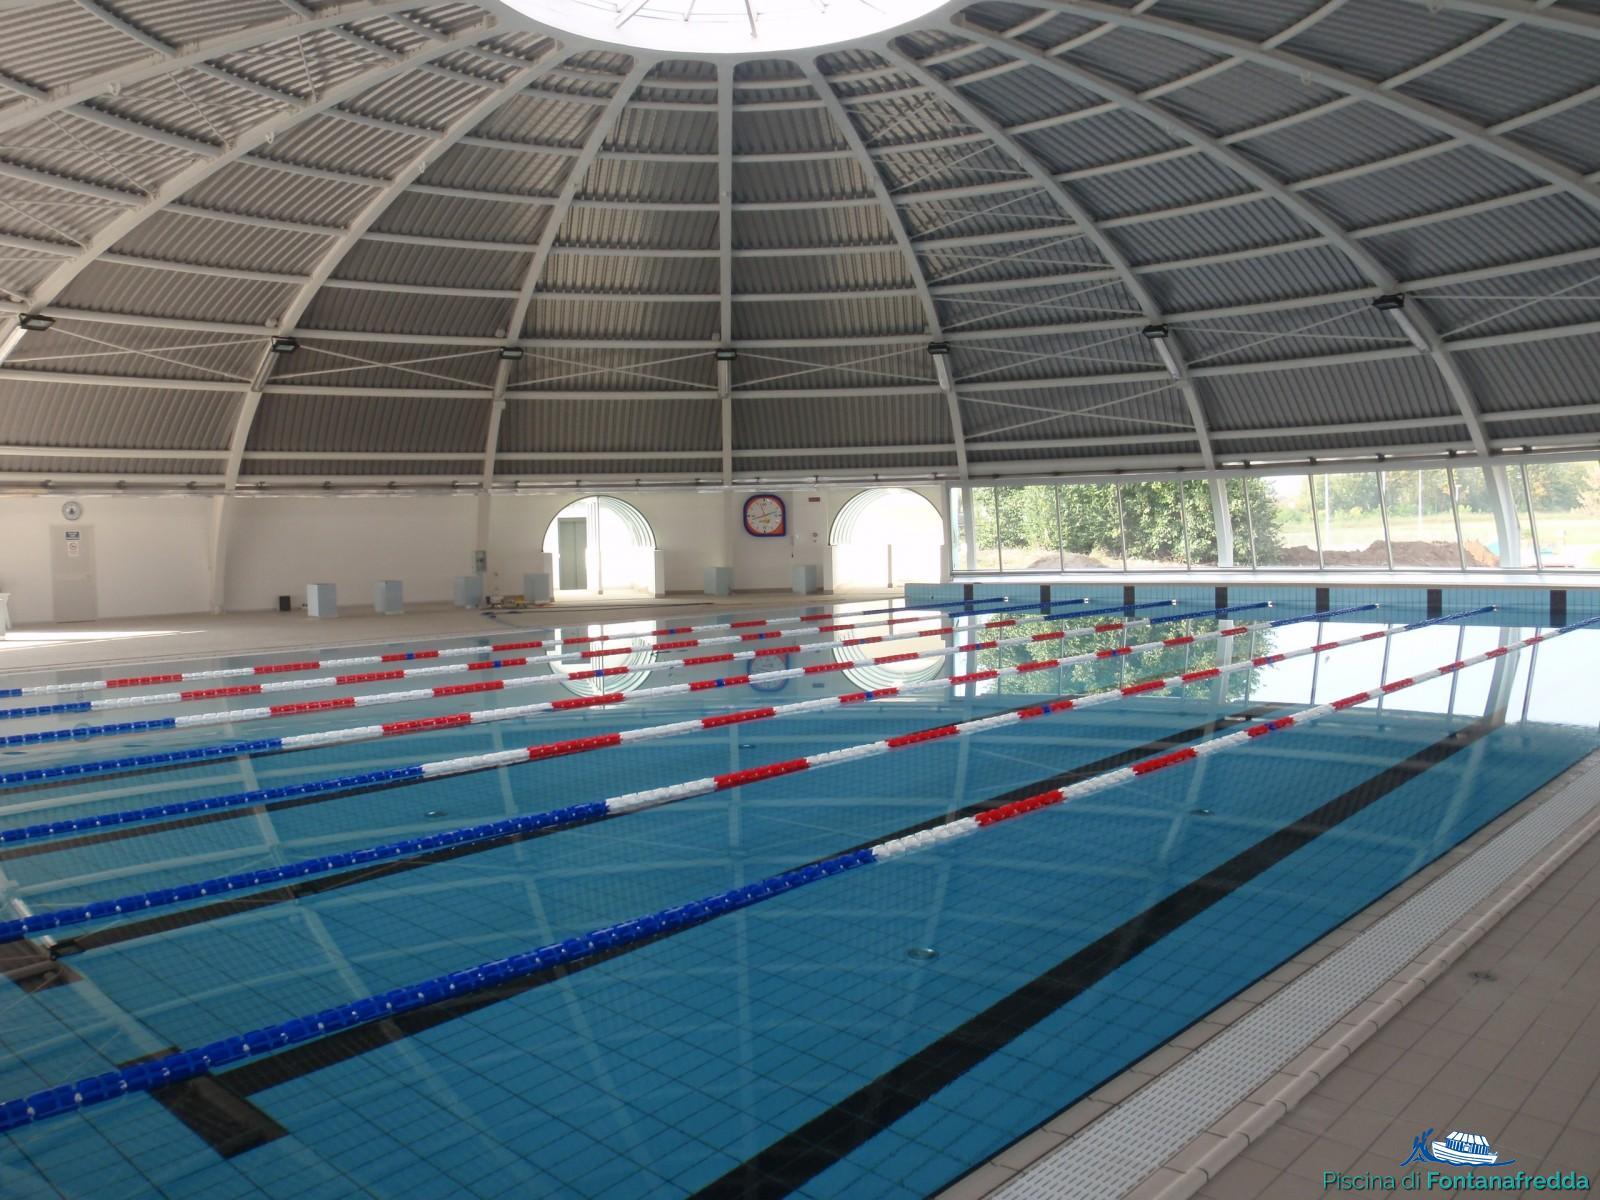 Vasca Da 25 Metri Tempi : Vasche ed impianto sportivo piscina di fontanafredda